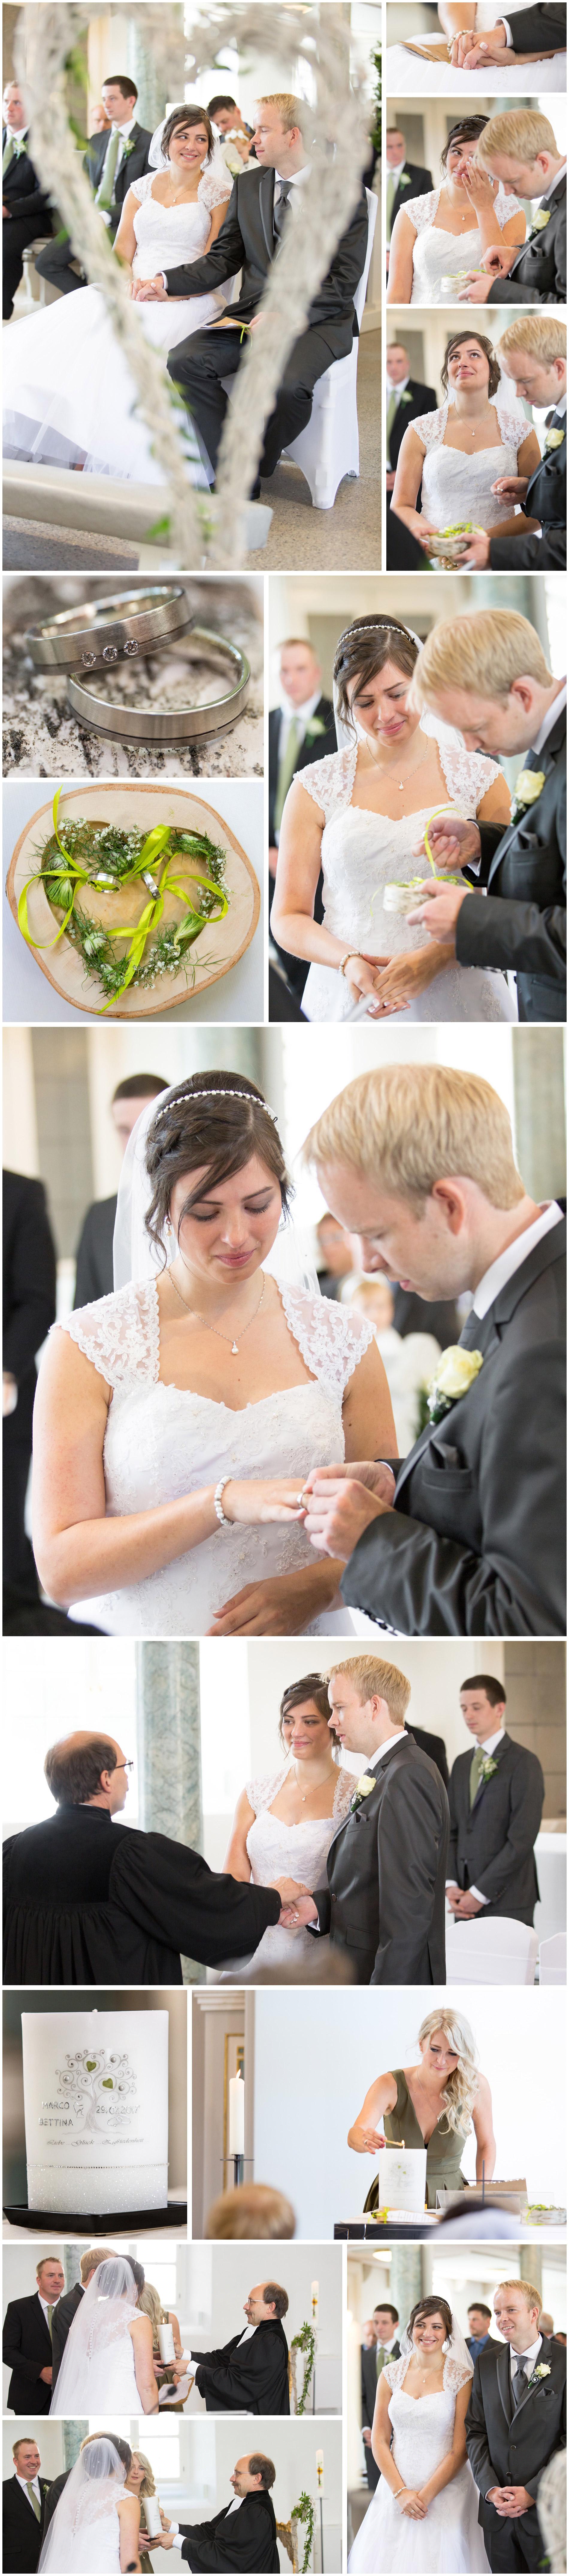 Kirche Konradsreuth – Stephanie Scharschmidt Hochzeitsfotograf Hof